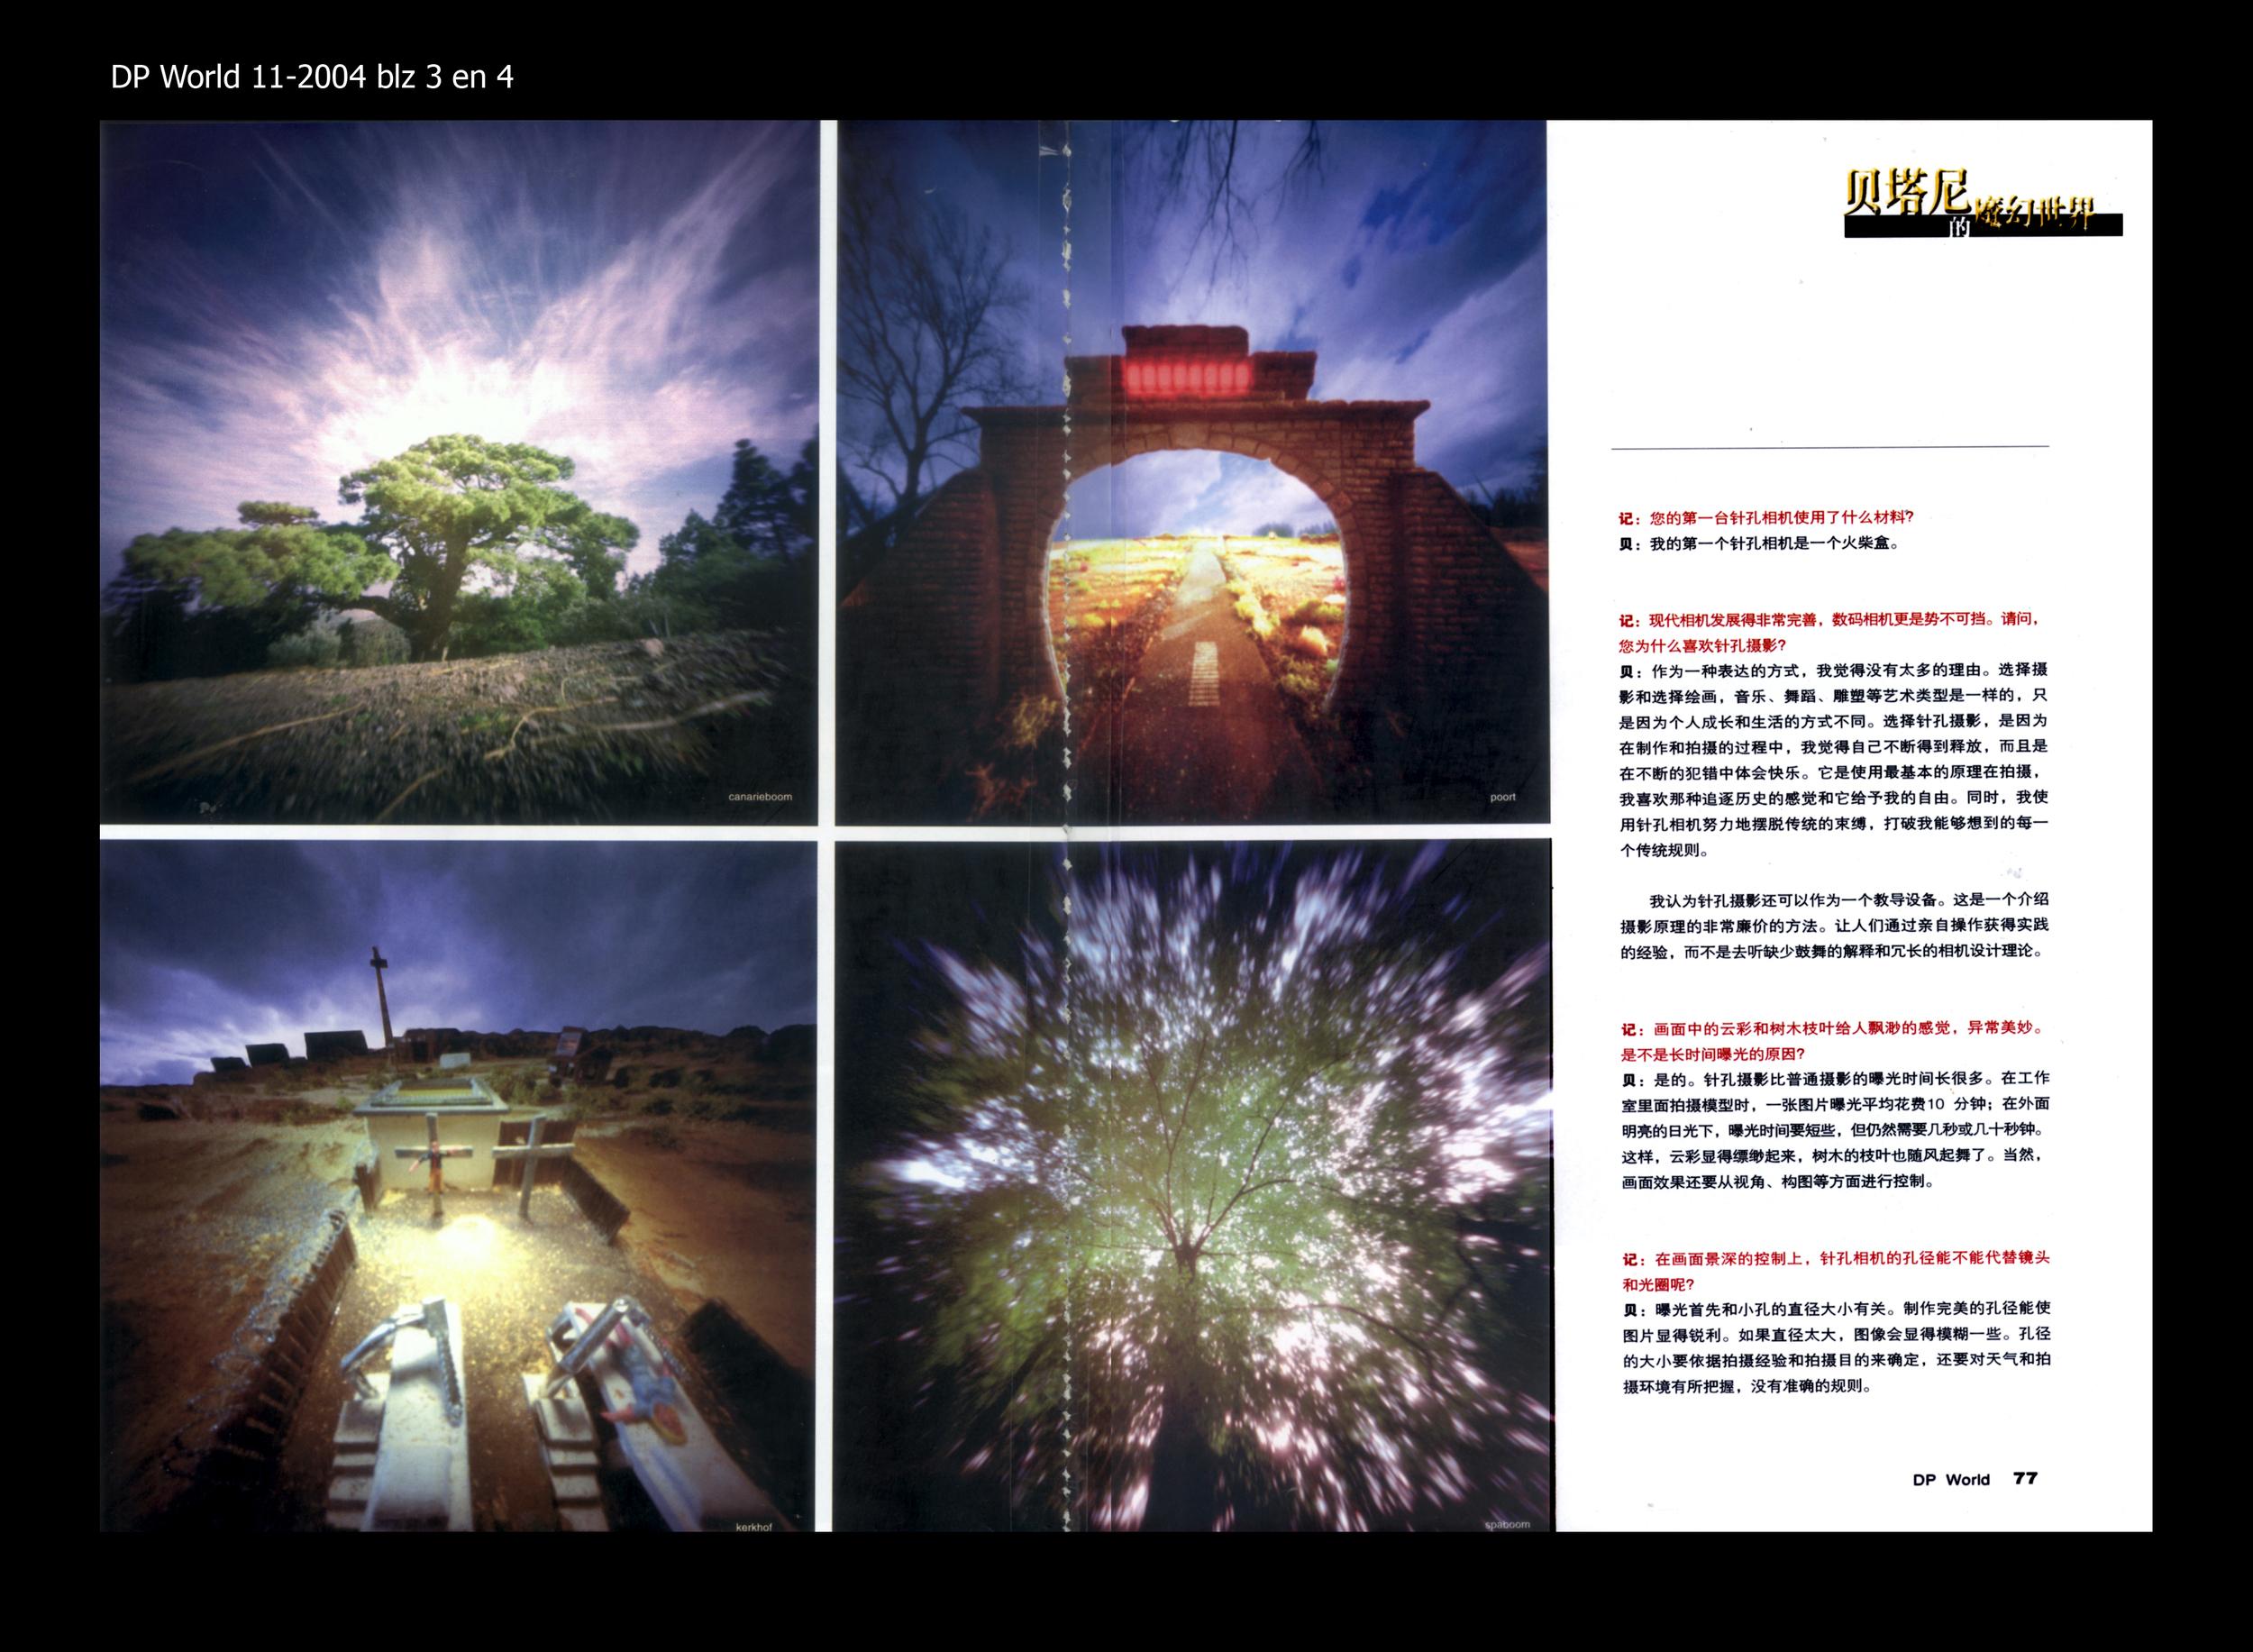 dp world 3 en 4.jpg